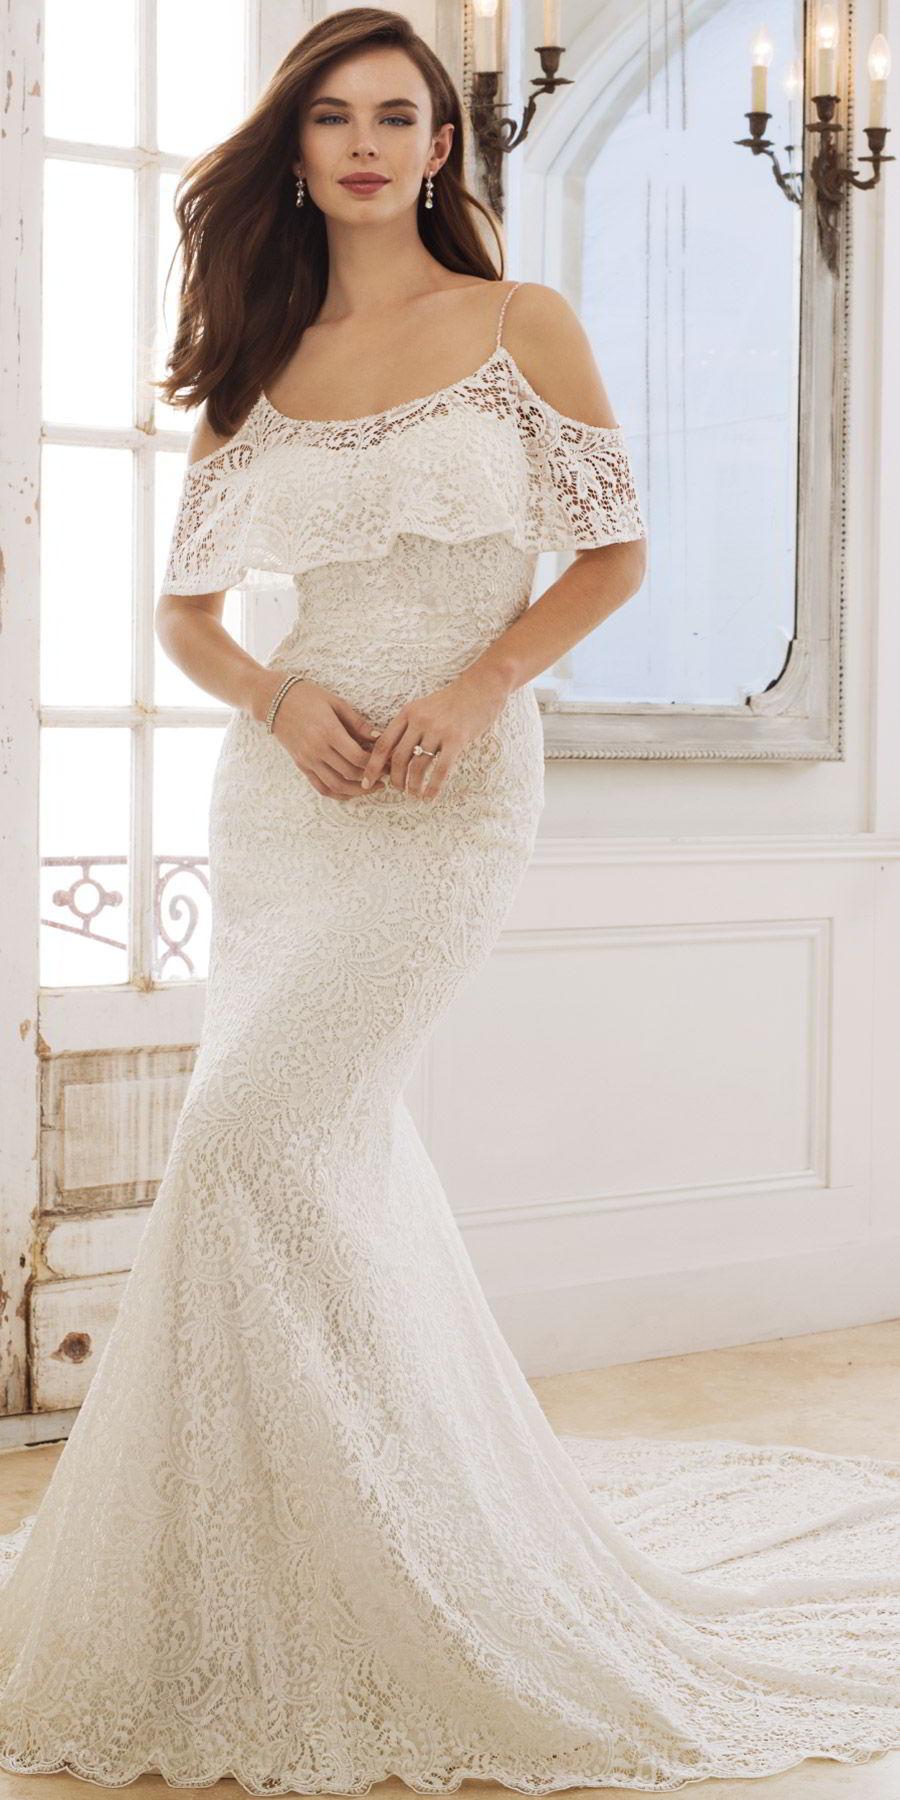 sophia tolli spring 2018 mon cheri bridals cold shoulder flutter sleeves beaded straps scoop neck sheath lace wedding dress (y11875 rhea) mv chapel train bohemian romantic